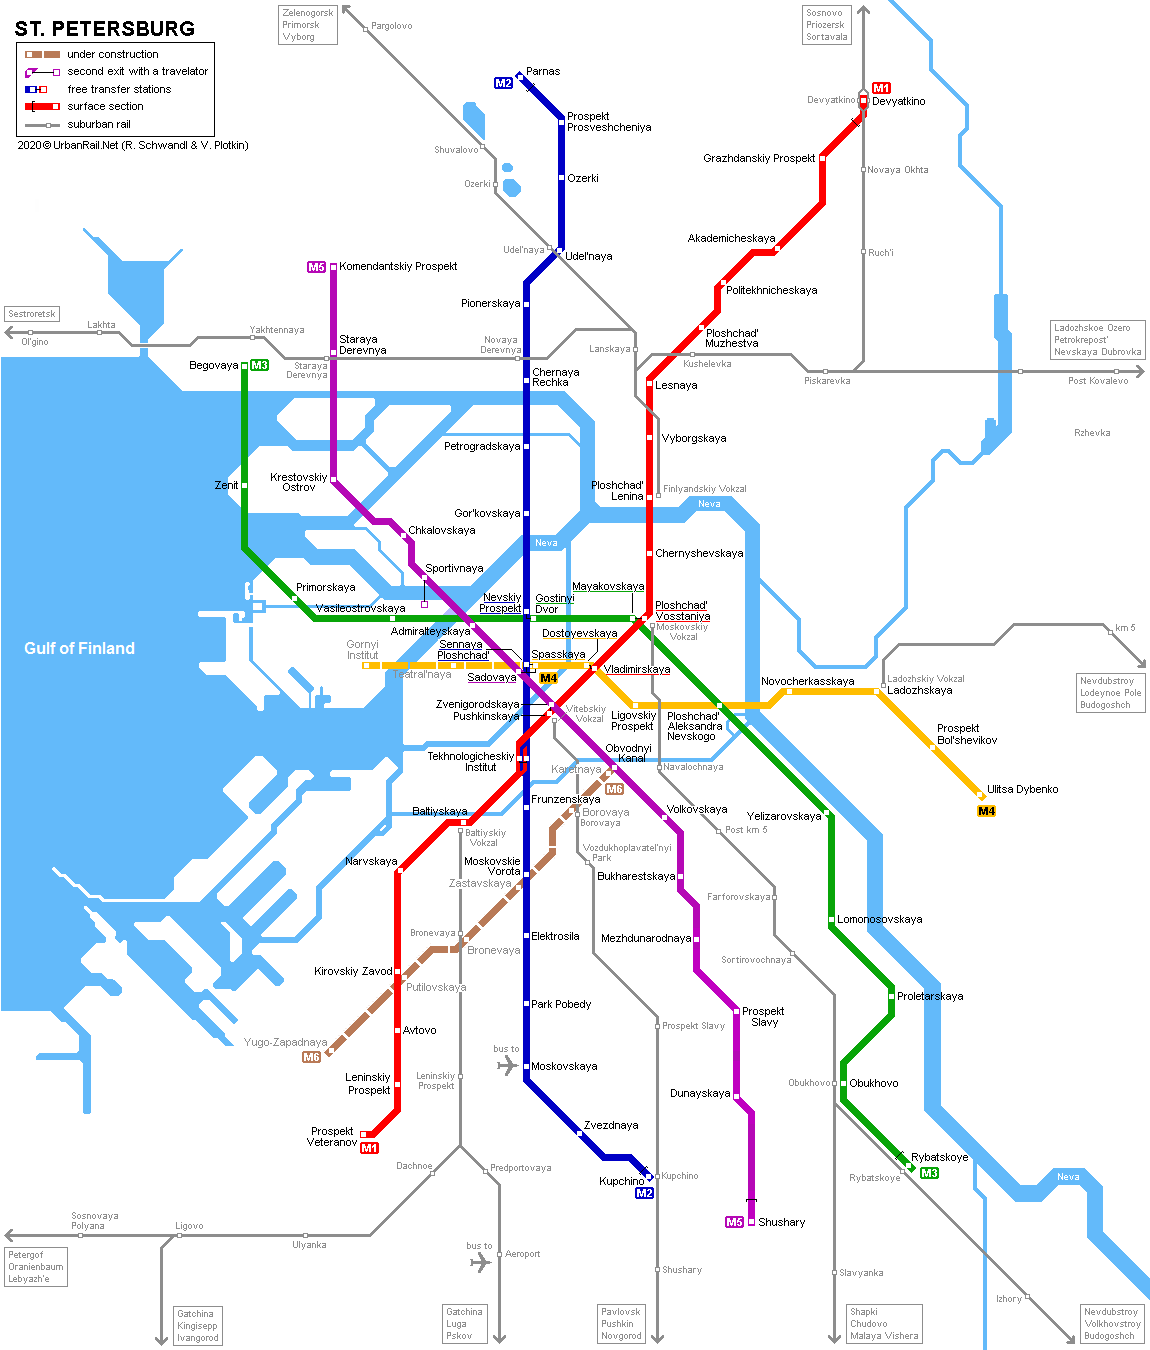 Saint Petersburg Russia Subway Map.Urbanrail Net Europe Russia St Petersburg Metro